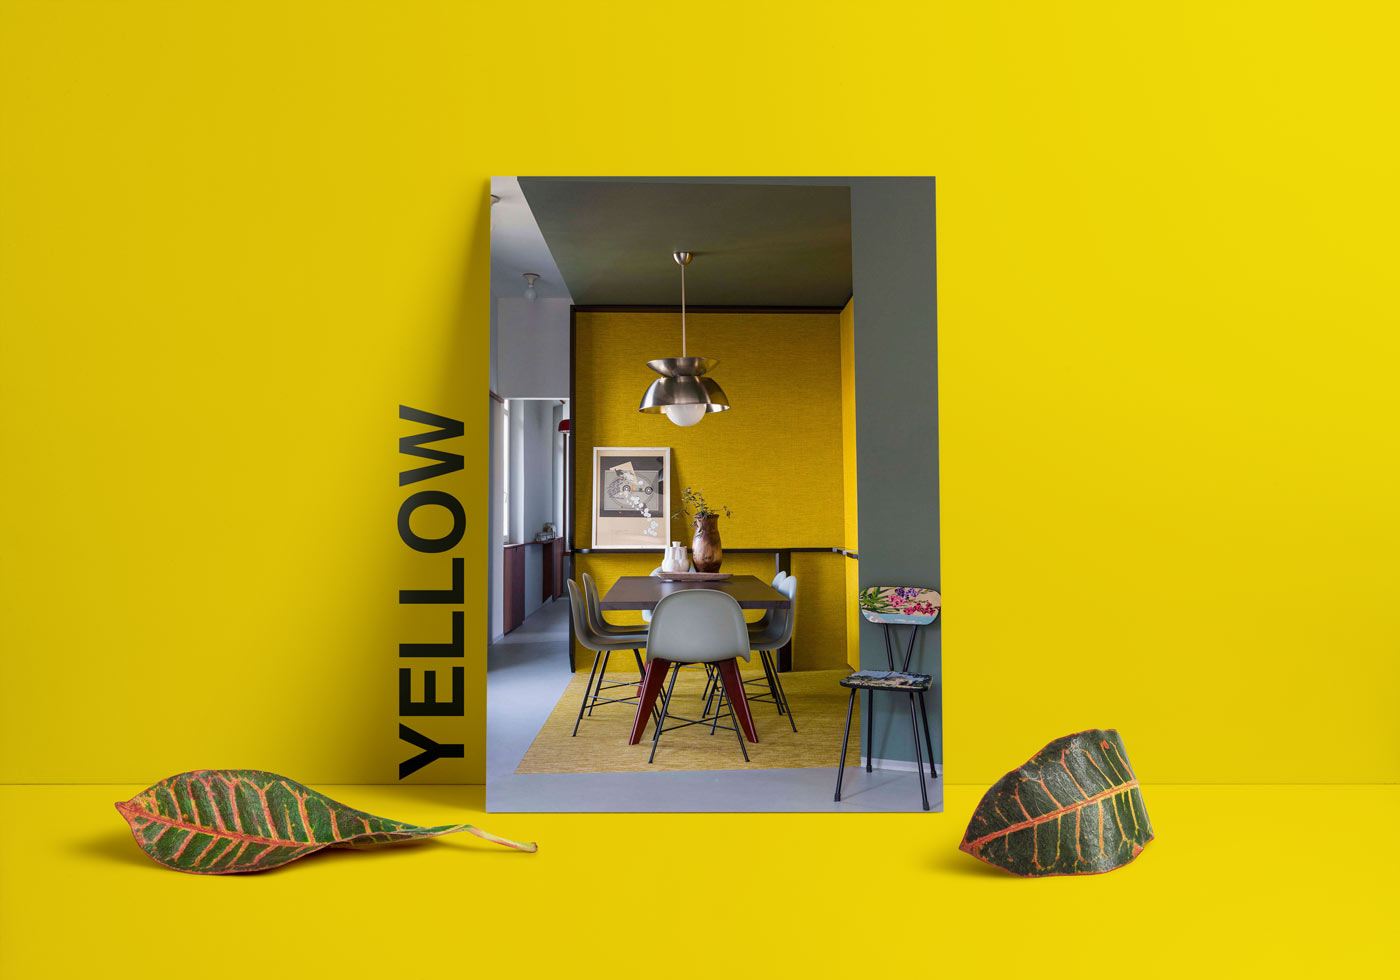 مزاج رنگ زرد